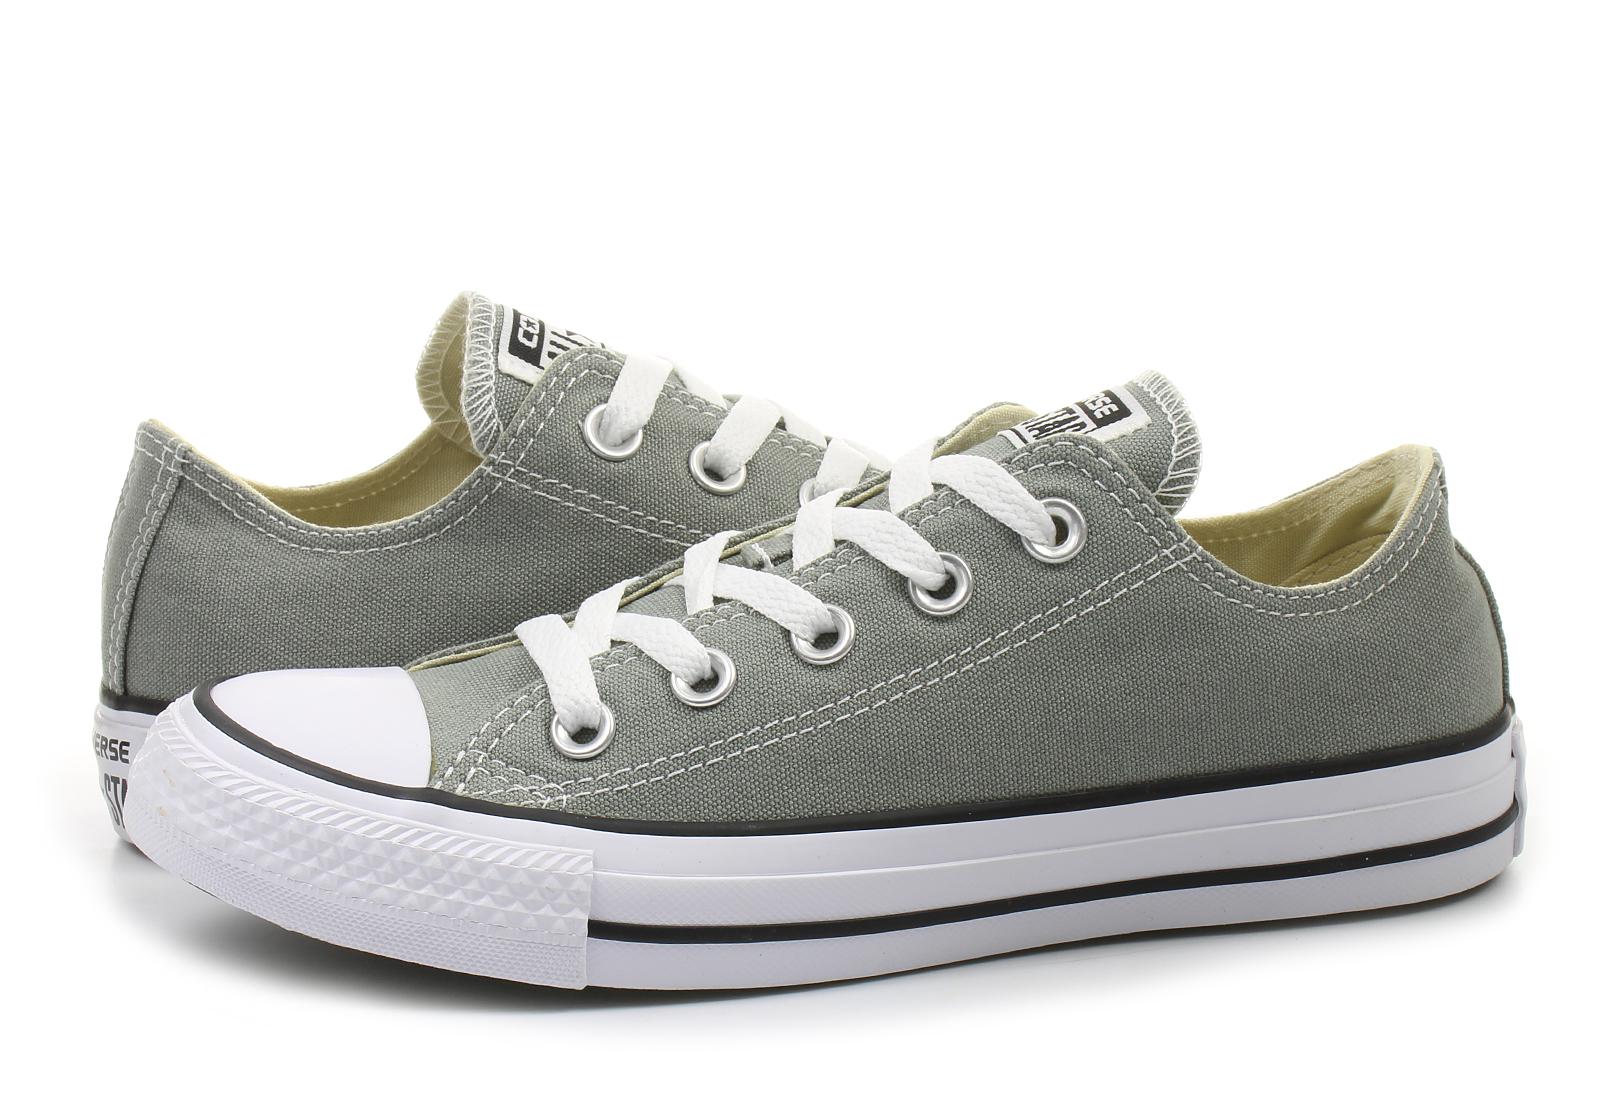 Converse Sneakers - Chuck Taylor All Star Seasonal Ox - 155575C ... 648720bb947